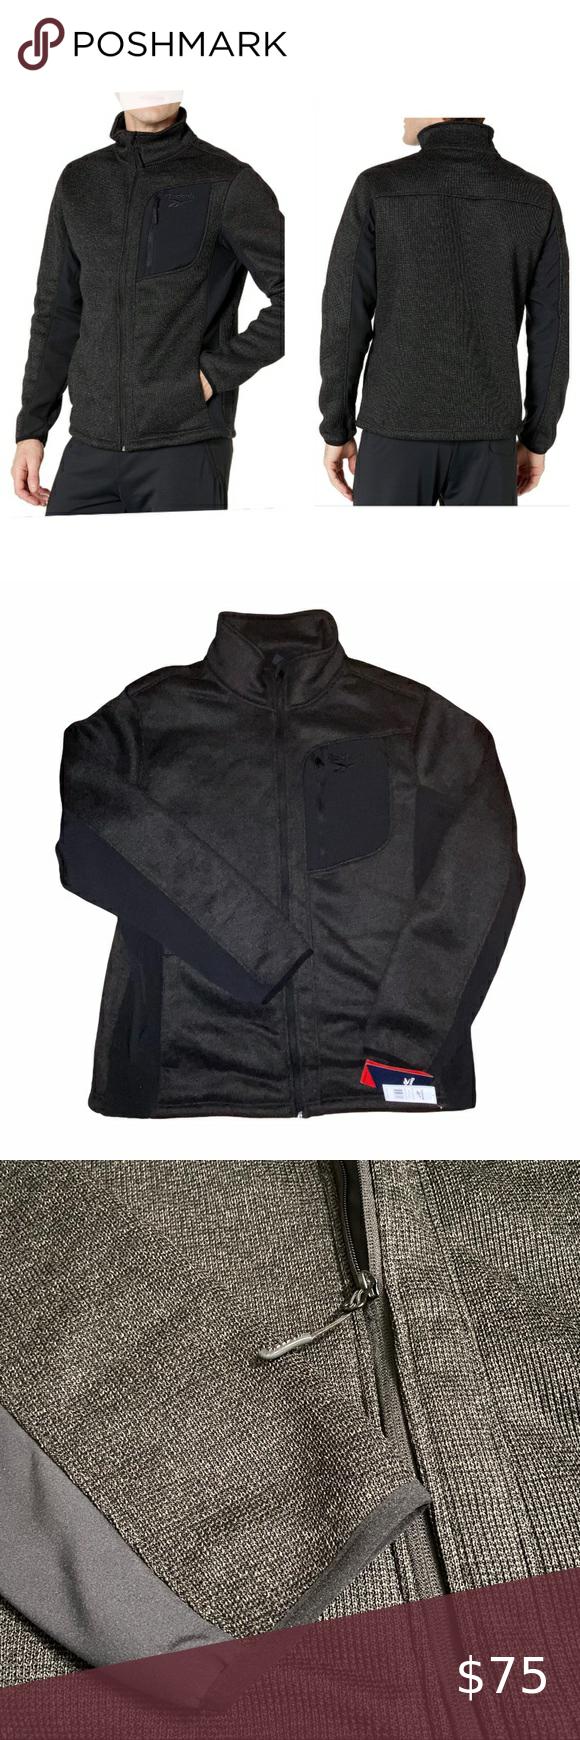 Reebok Textured Outerwear Jacket Heather Black Outerwear Jackets Heather Black Outerwear [ 1740 x 580 Pixel ]